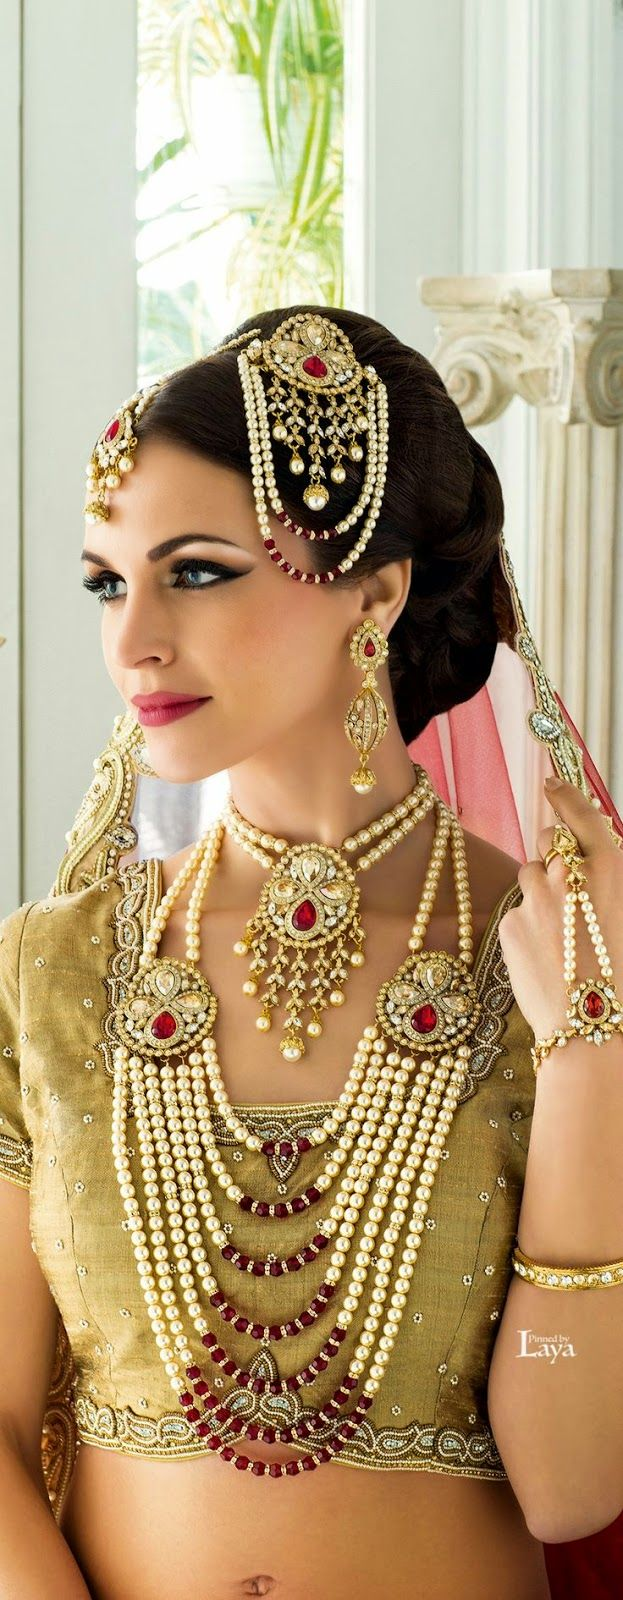 best ideas about 花嫁衣装 インド on pinterest インドの